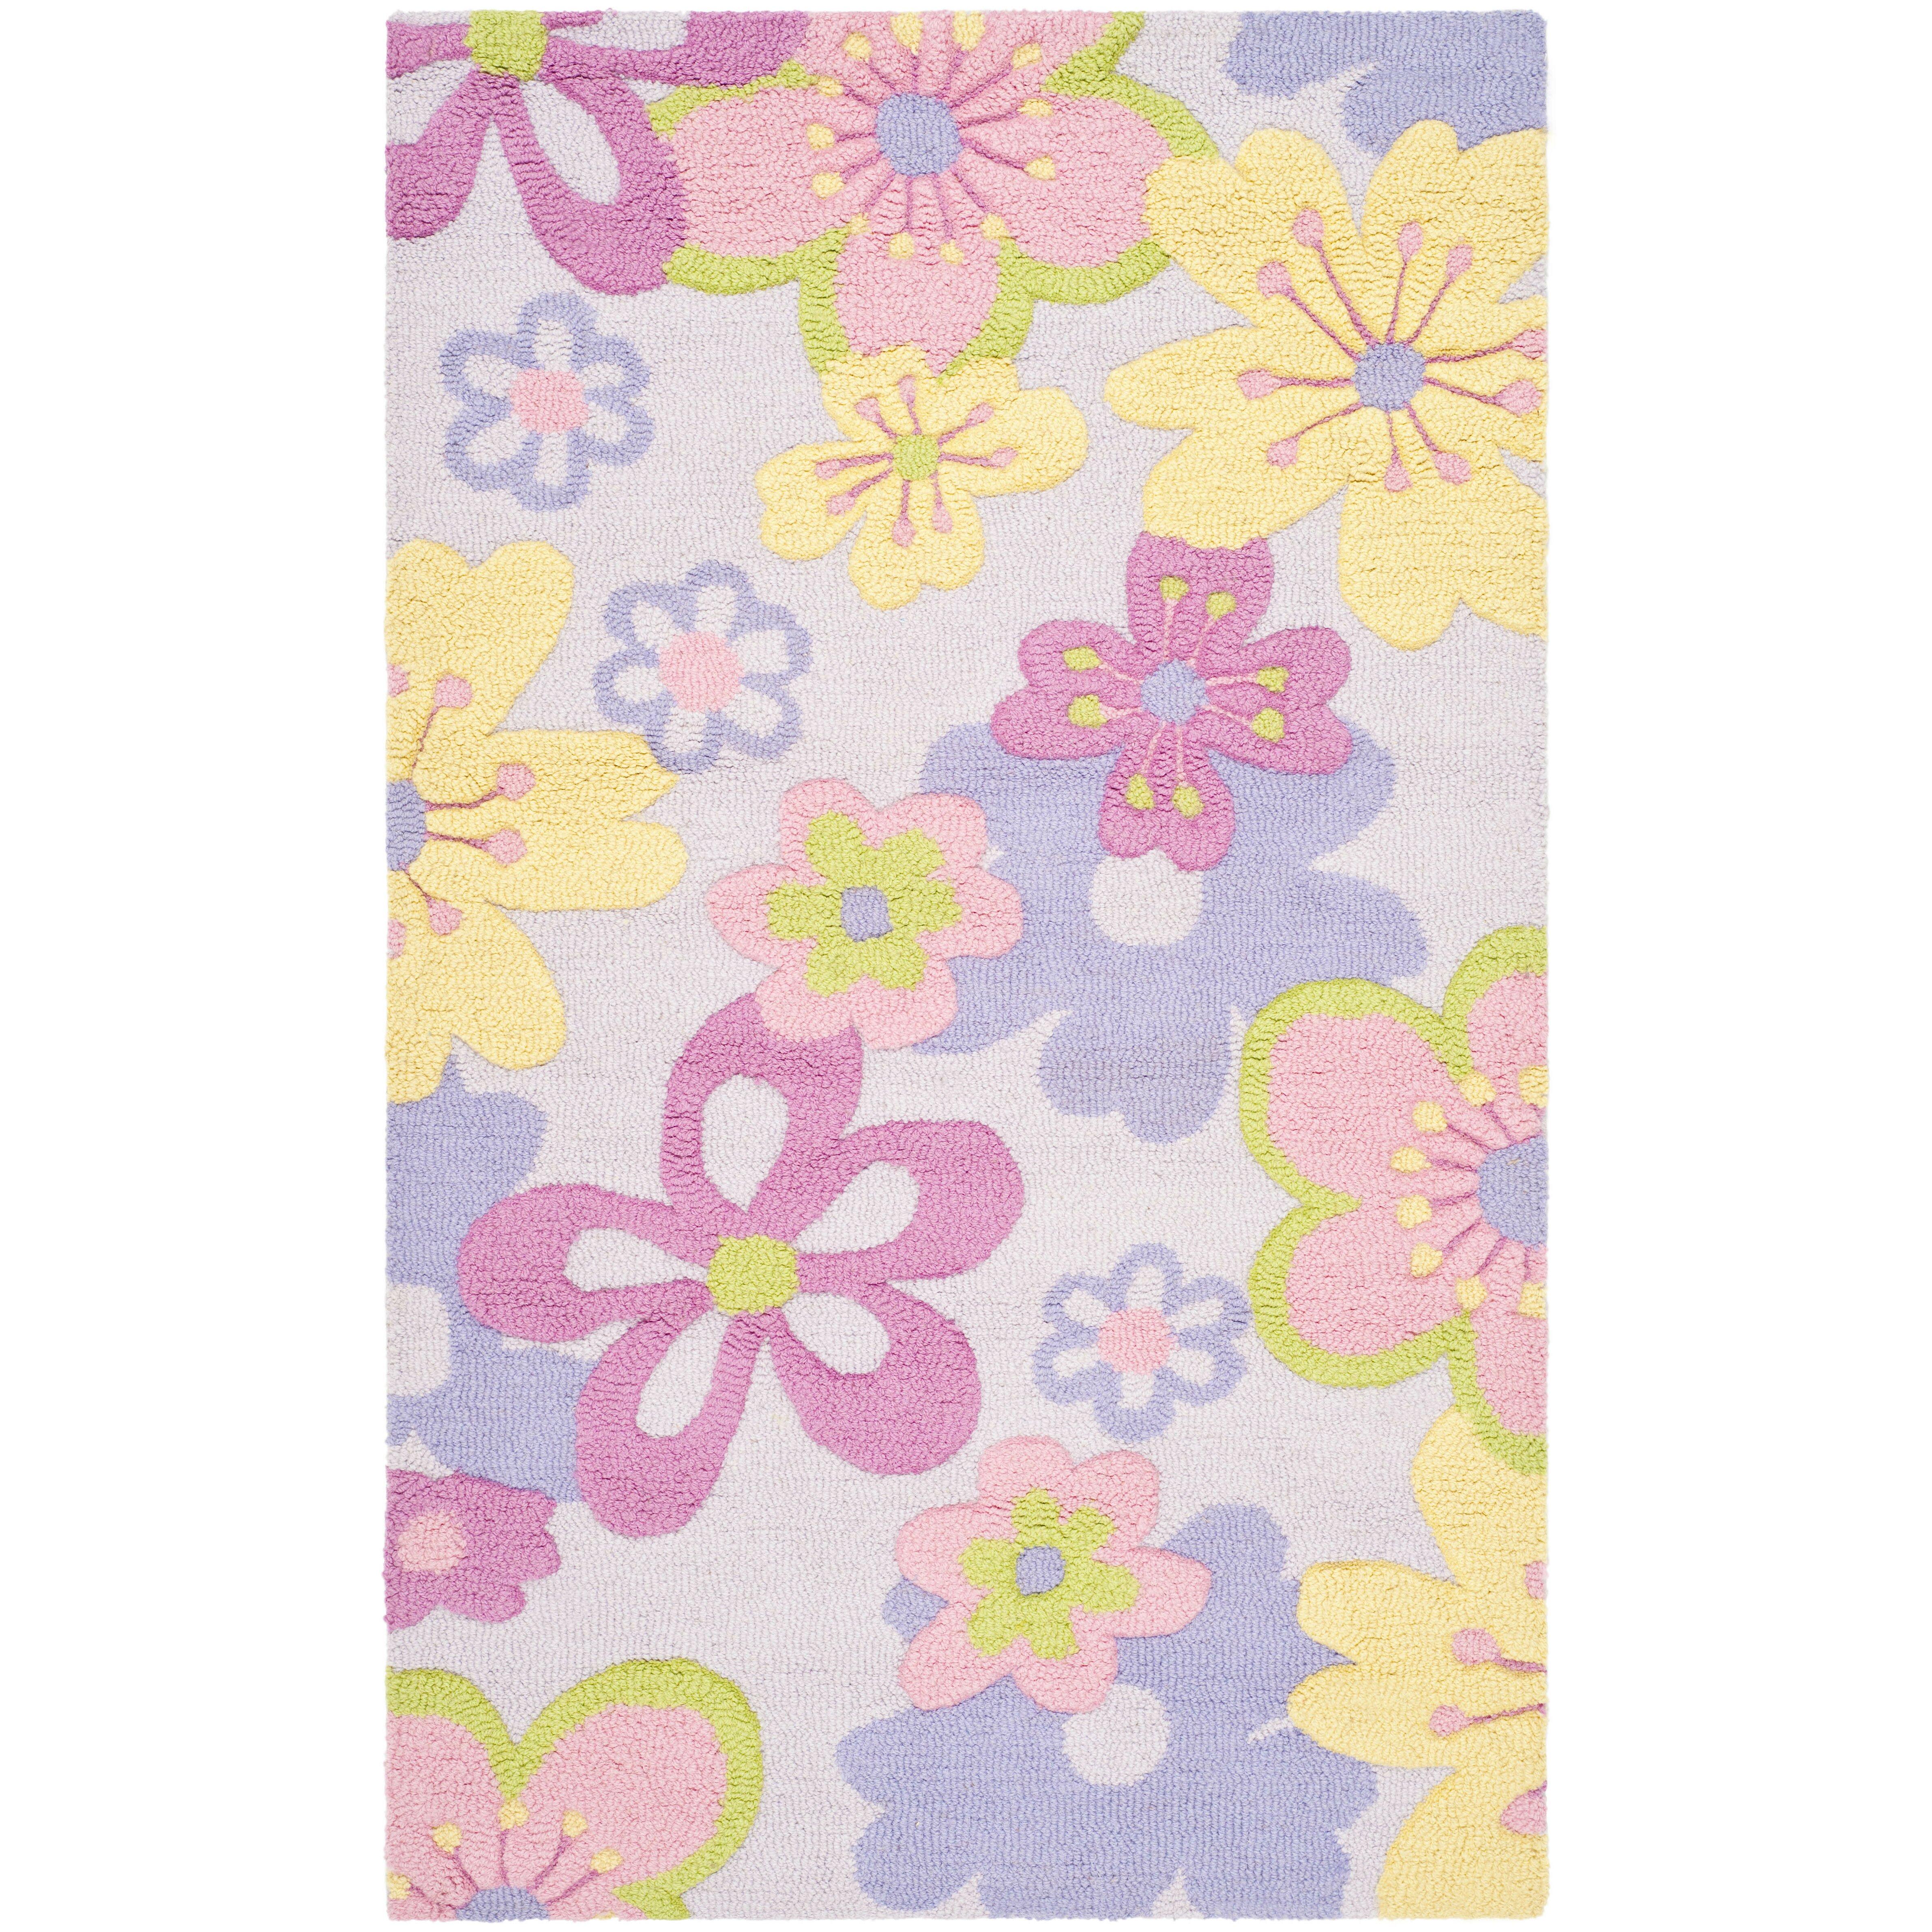 viv rae levar handtufted pinkpurple area rug bliss shag hot pink